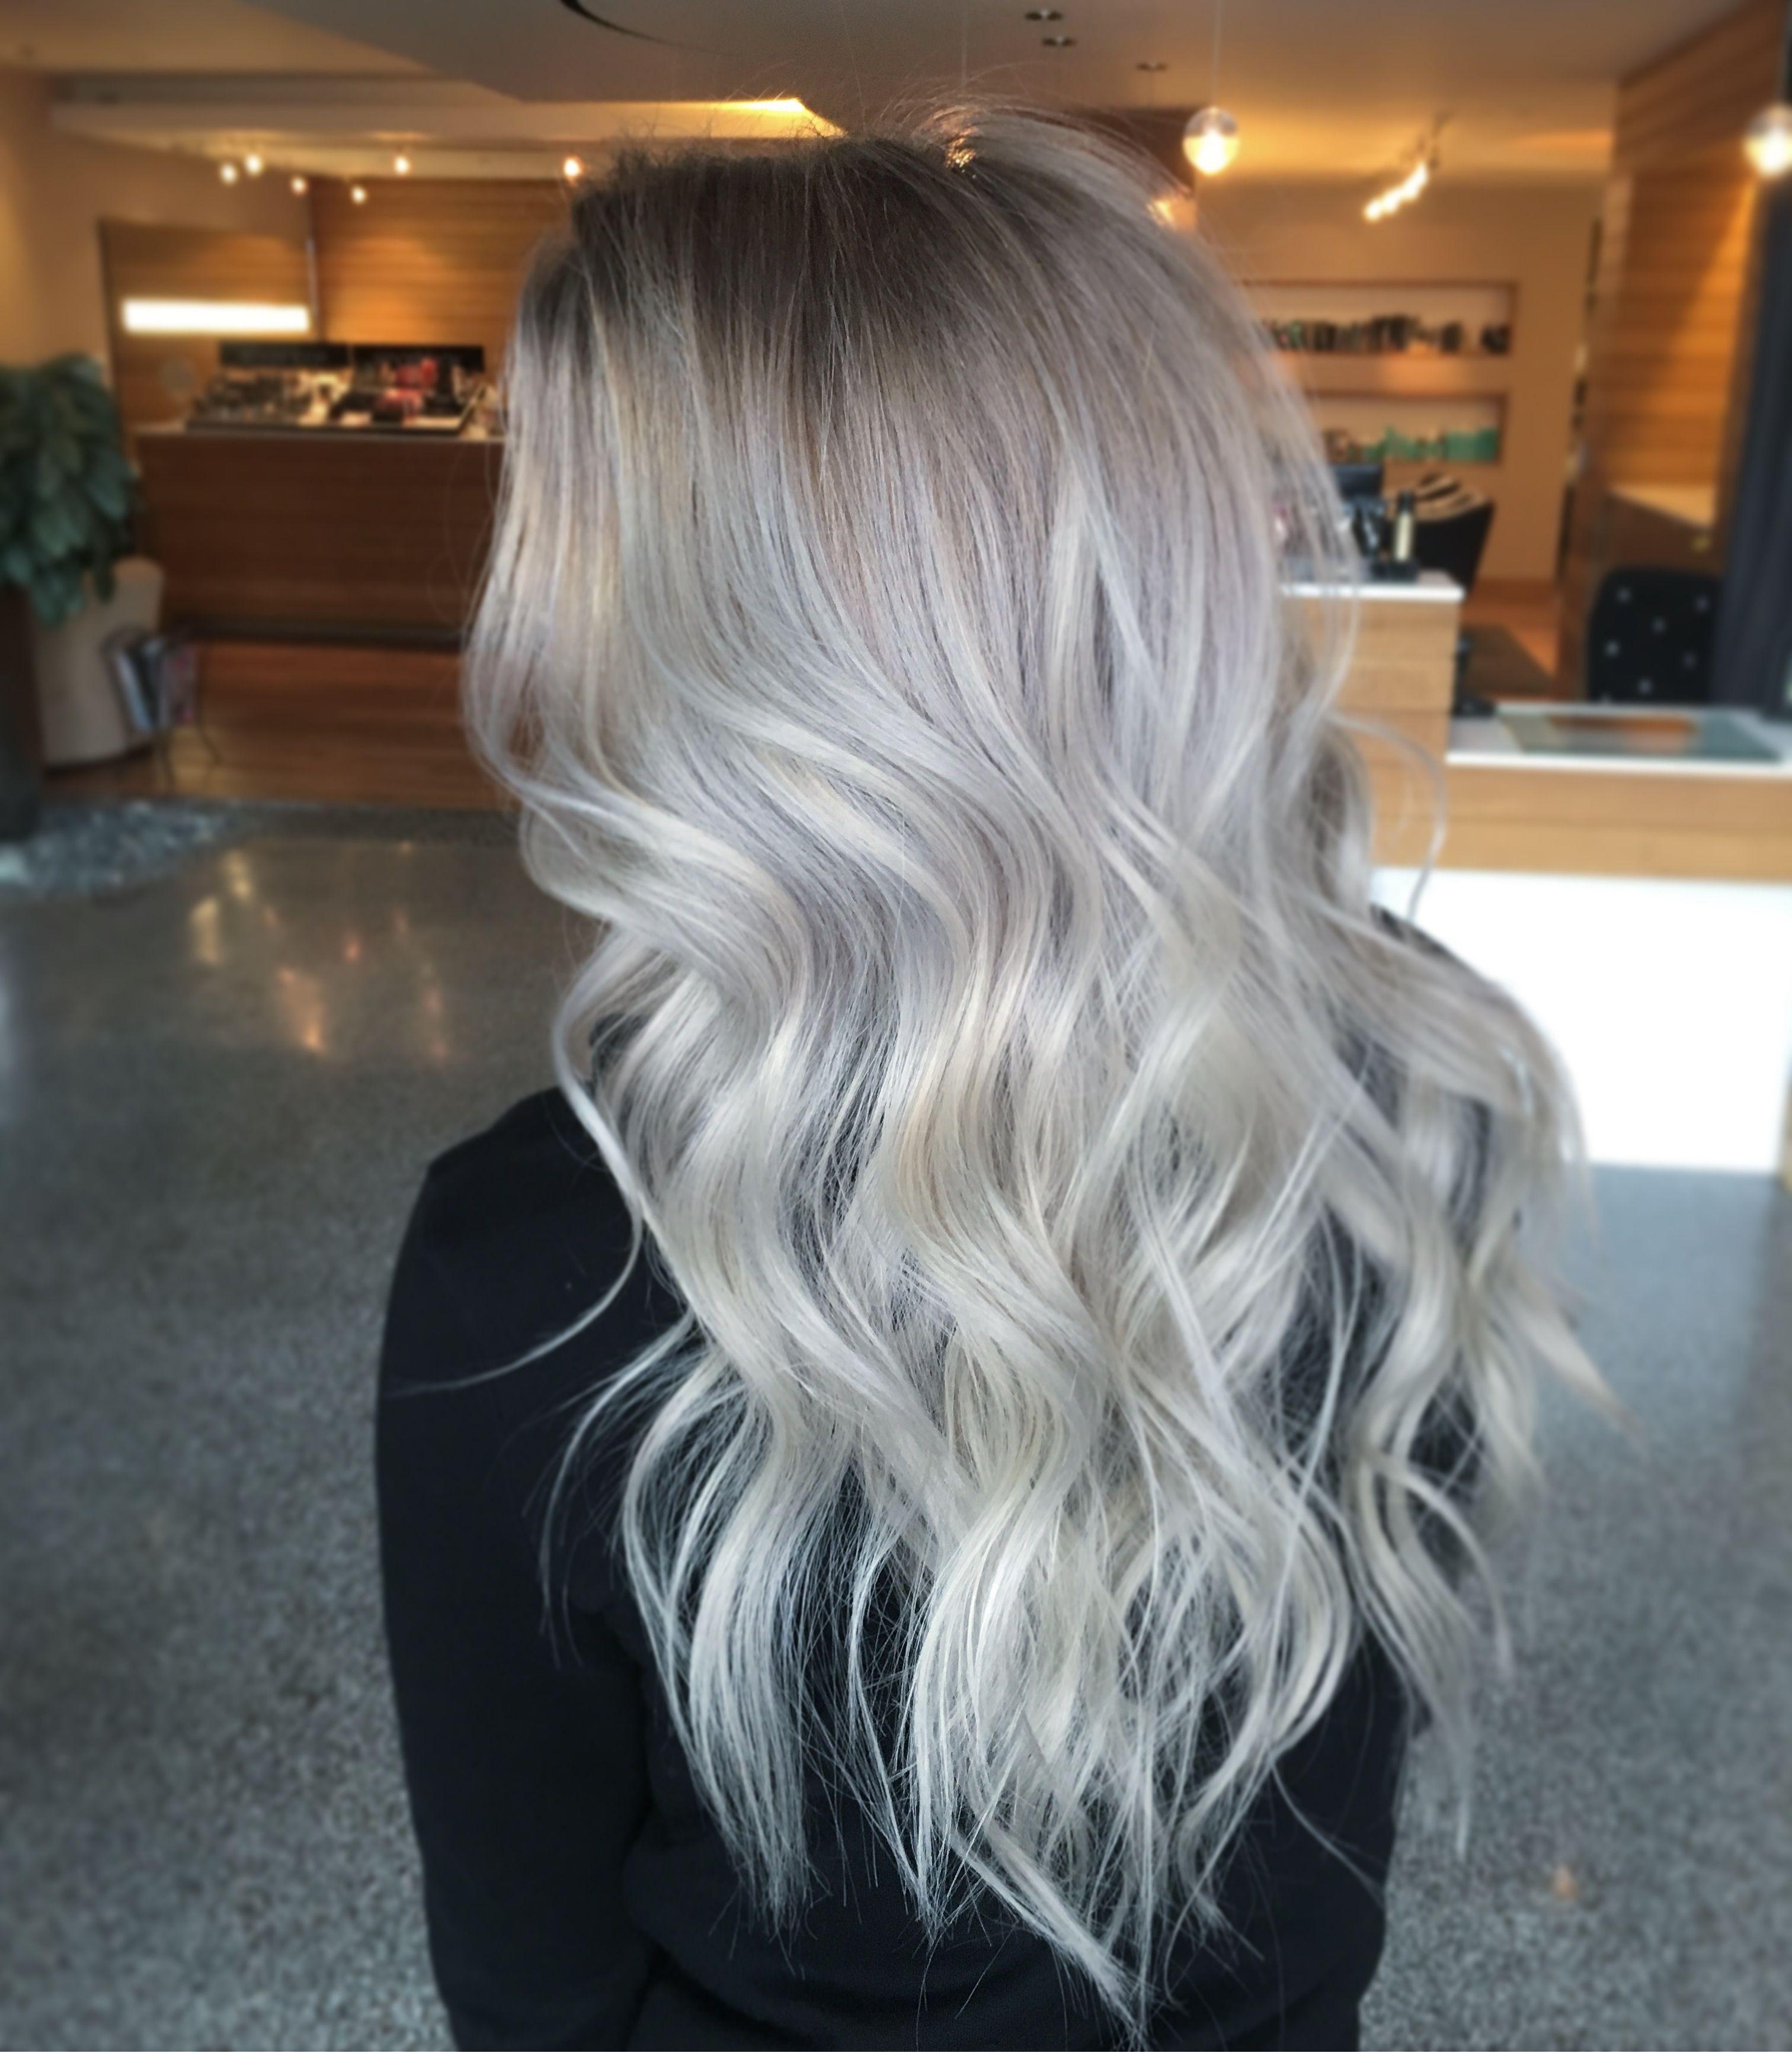 silver blonde hair hair pinterest silver blonde hair. Black Bedroom Furniture Sets. Home Design Ideas